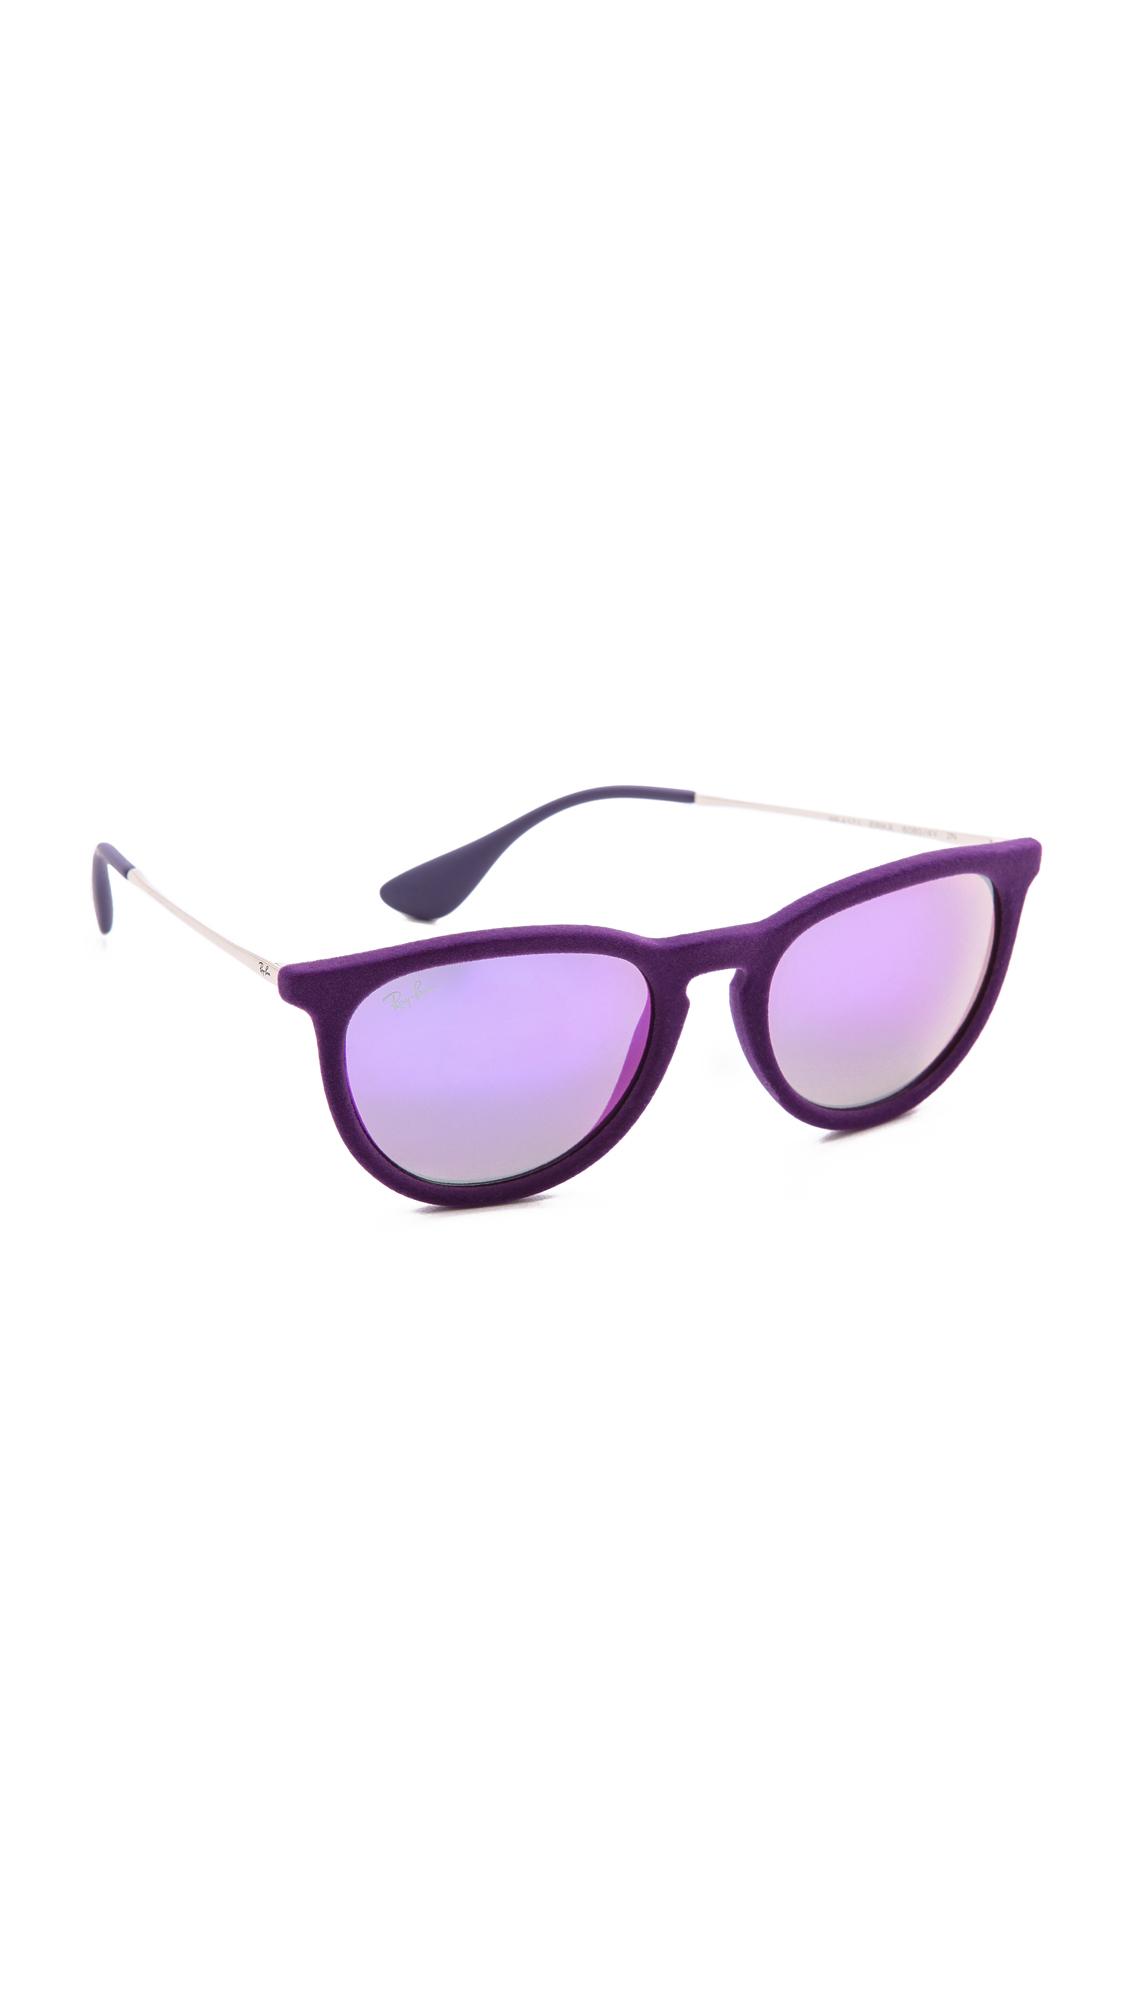 530c6bab50 Lyst - Ray-Ban Erika Velvet Sunglasses - Violet in Purple